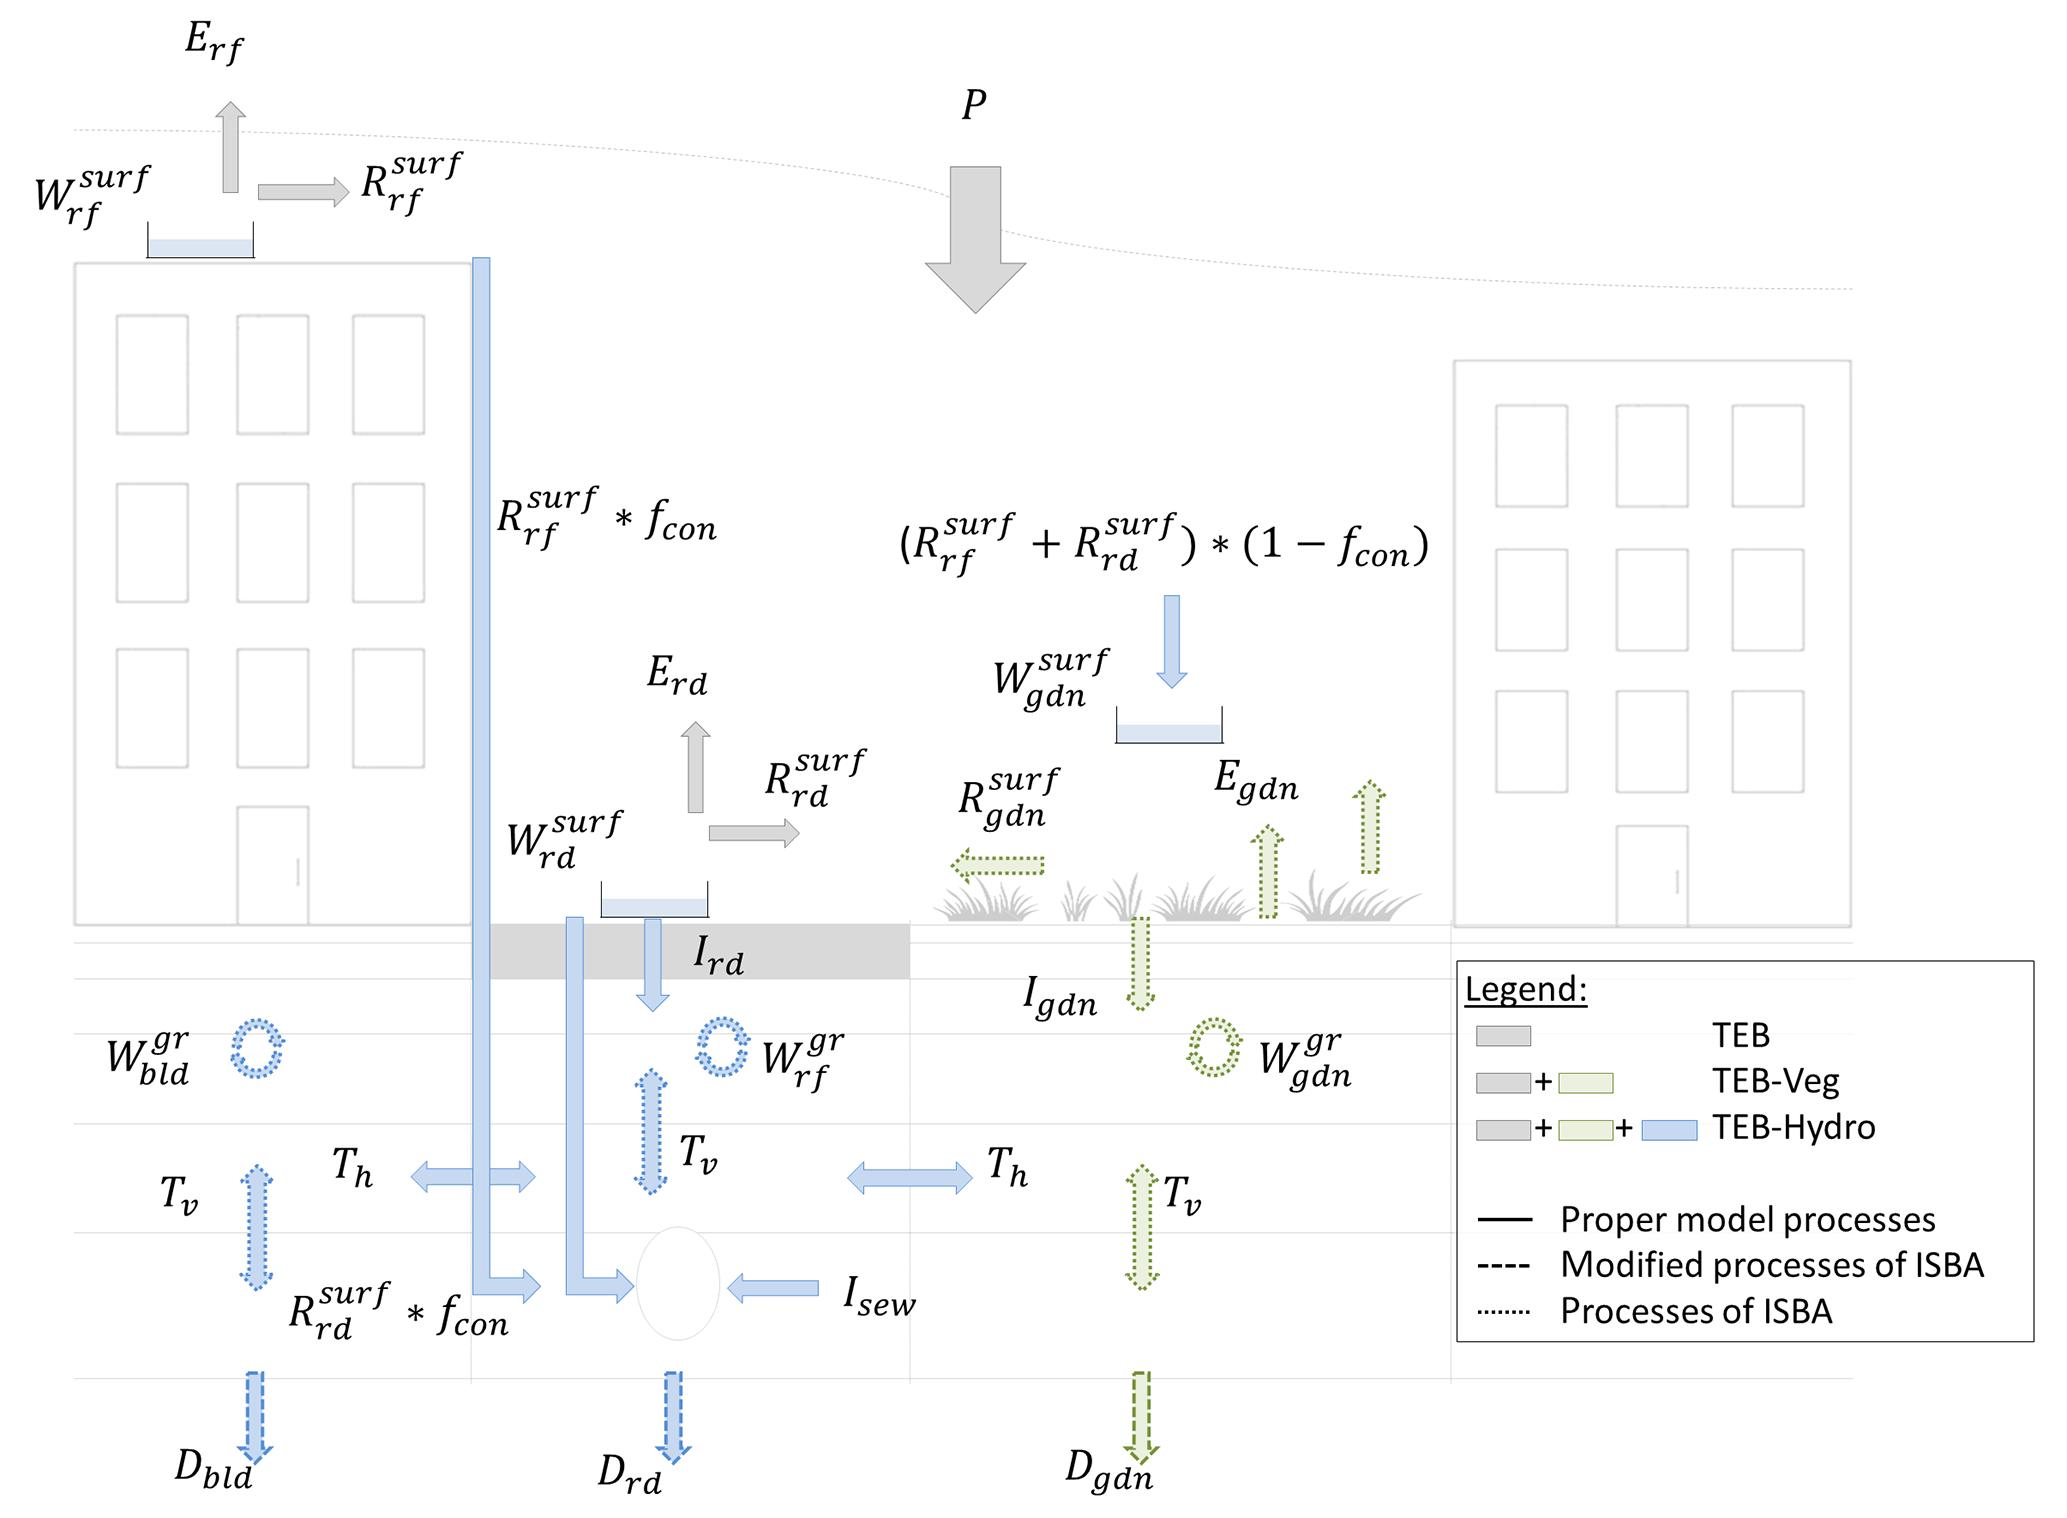 Scheme Described Genie Wiring Diagrams Hydraulic And Pneumatic